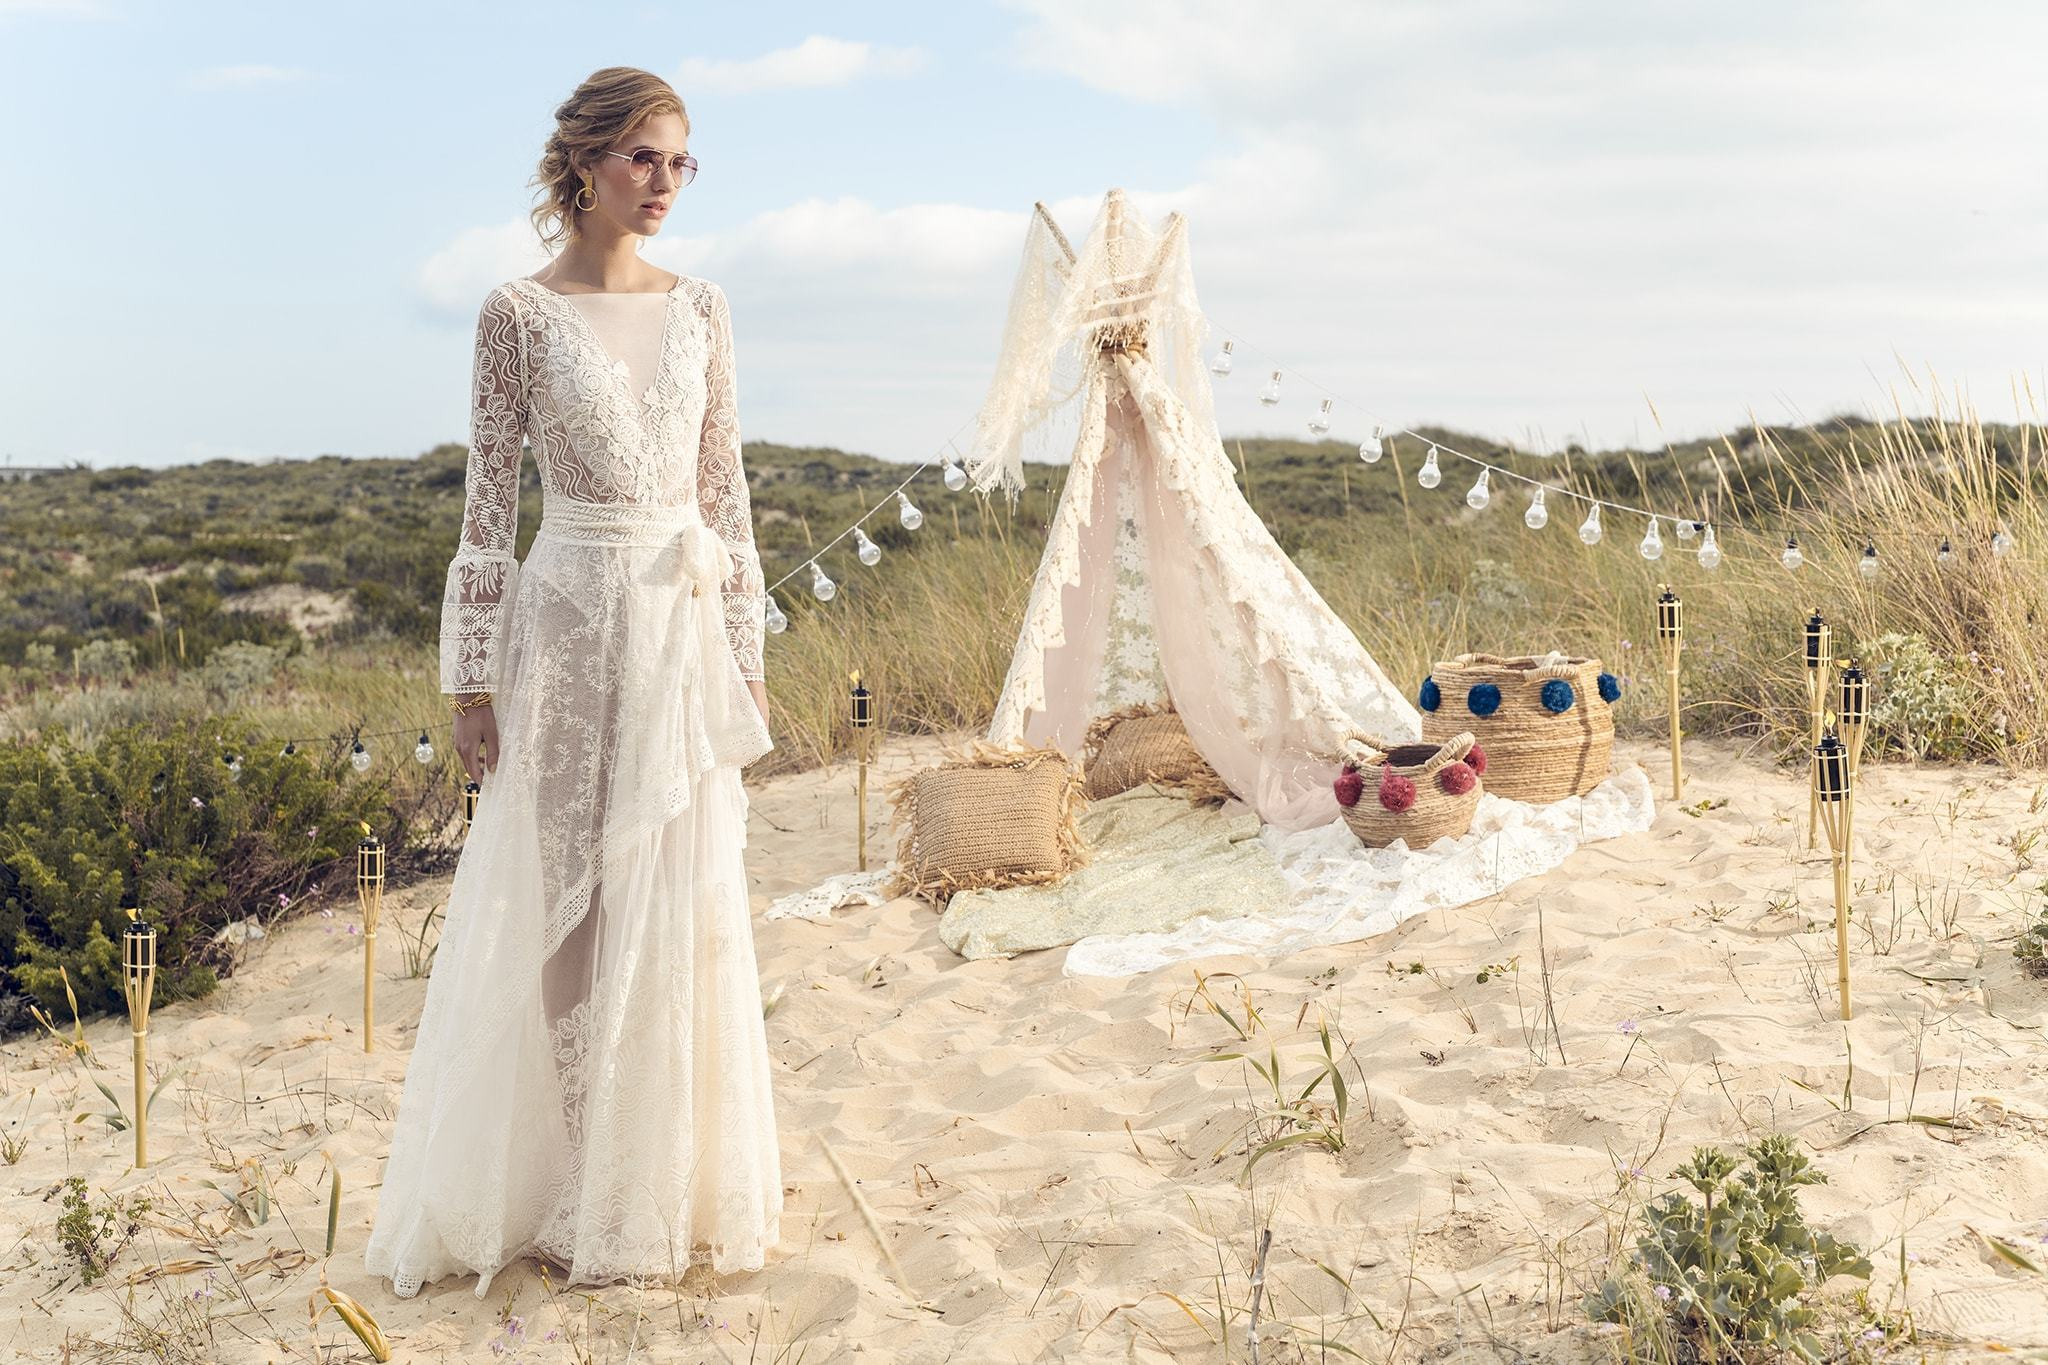 Boho Trouwjurk Kopen.Bohemian Trouwjurken Inspiratie Voor De Perfecte Boho Bruidsjurk